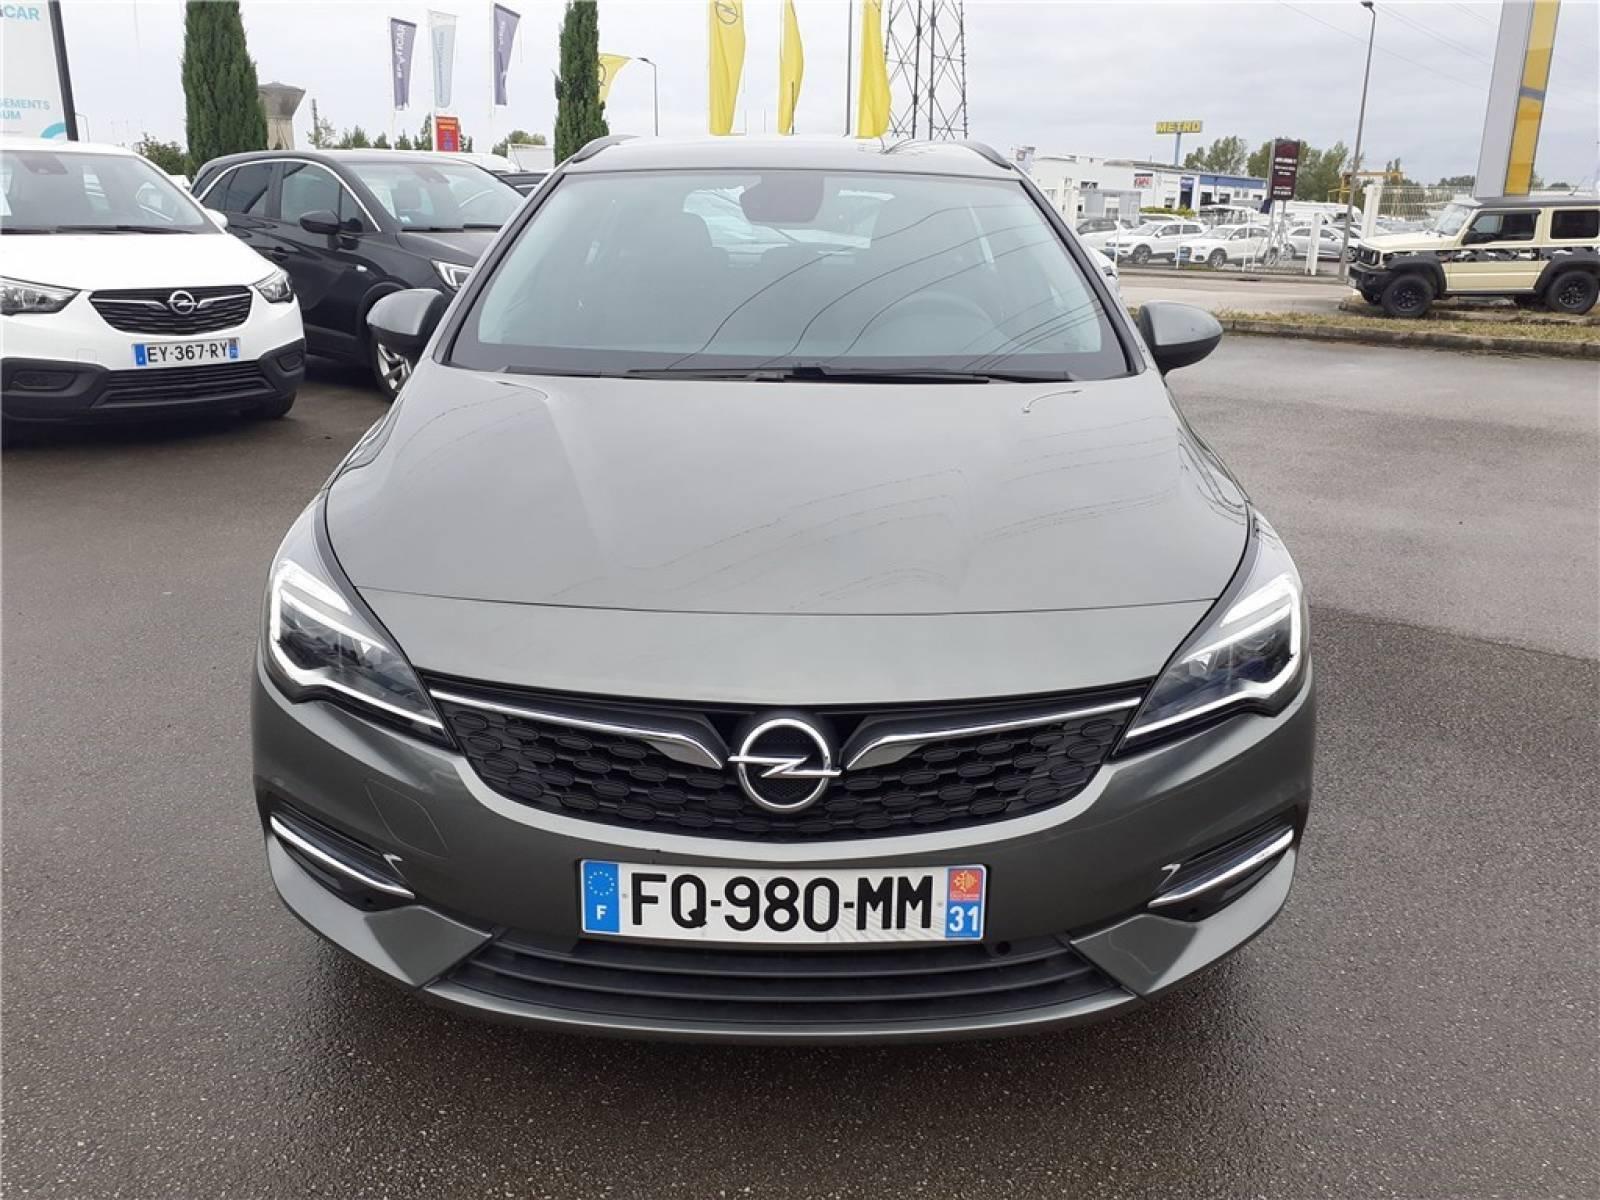 OPEL Astra Sports Tourer 1.5 Diesel 122 ch BVA9 - véhicule d'occasion - Groupe Guillet - Opel Magicauto - Chalon-sur-Saône - 71380 - Saint-Marcel - 12